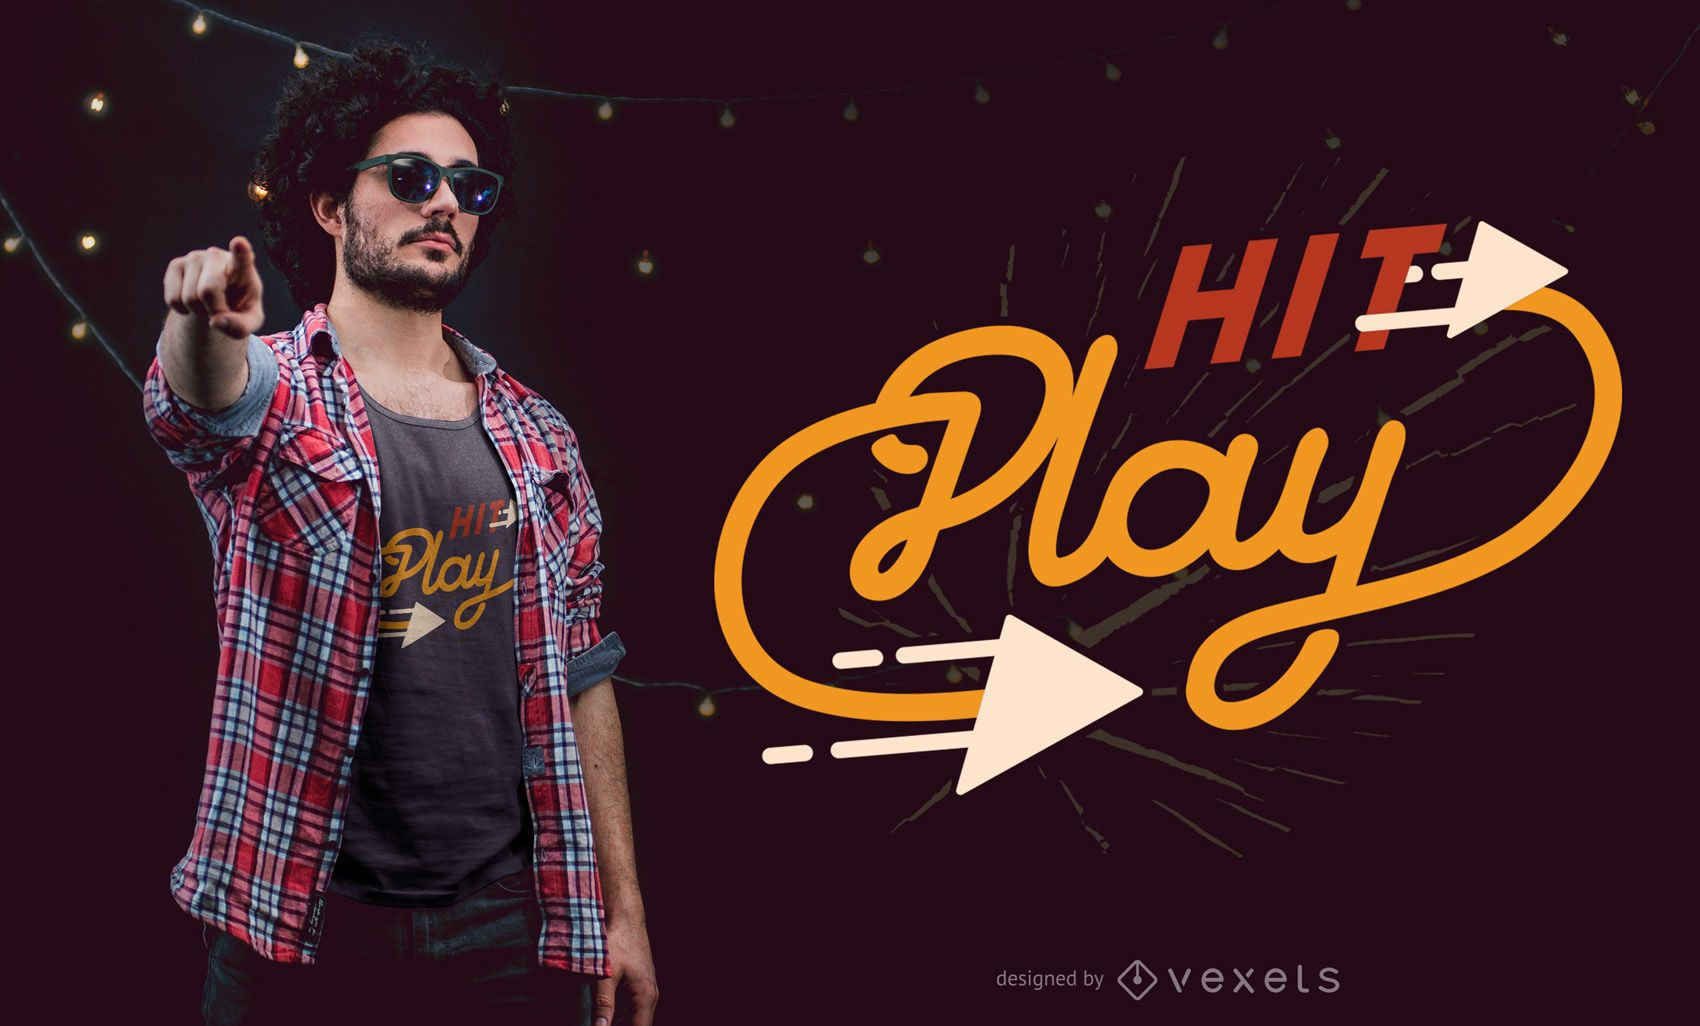 Hit play t-shirt design